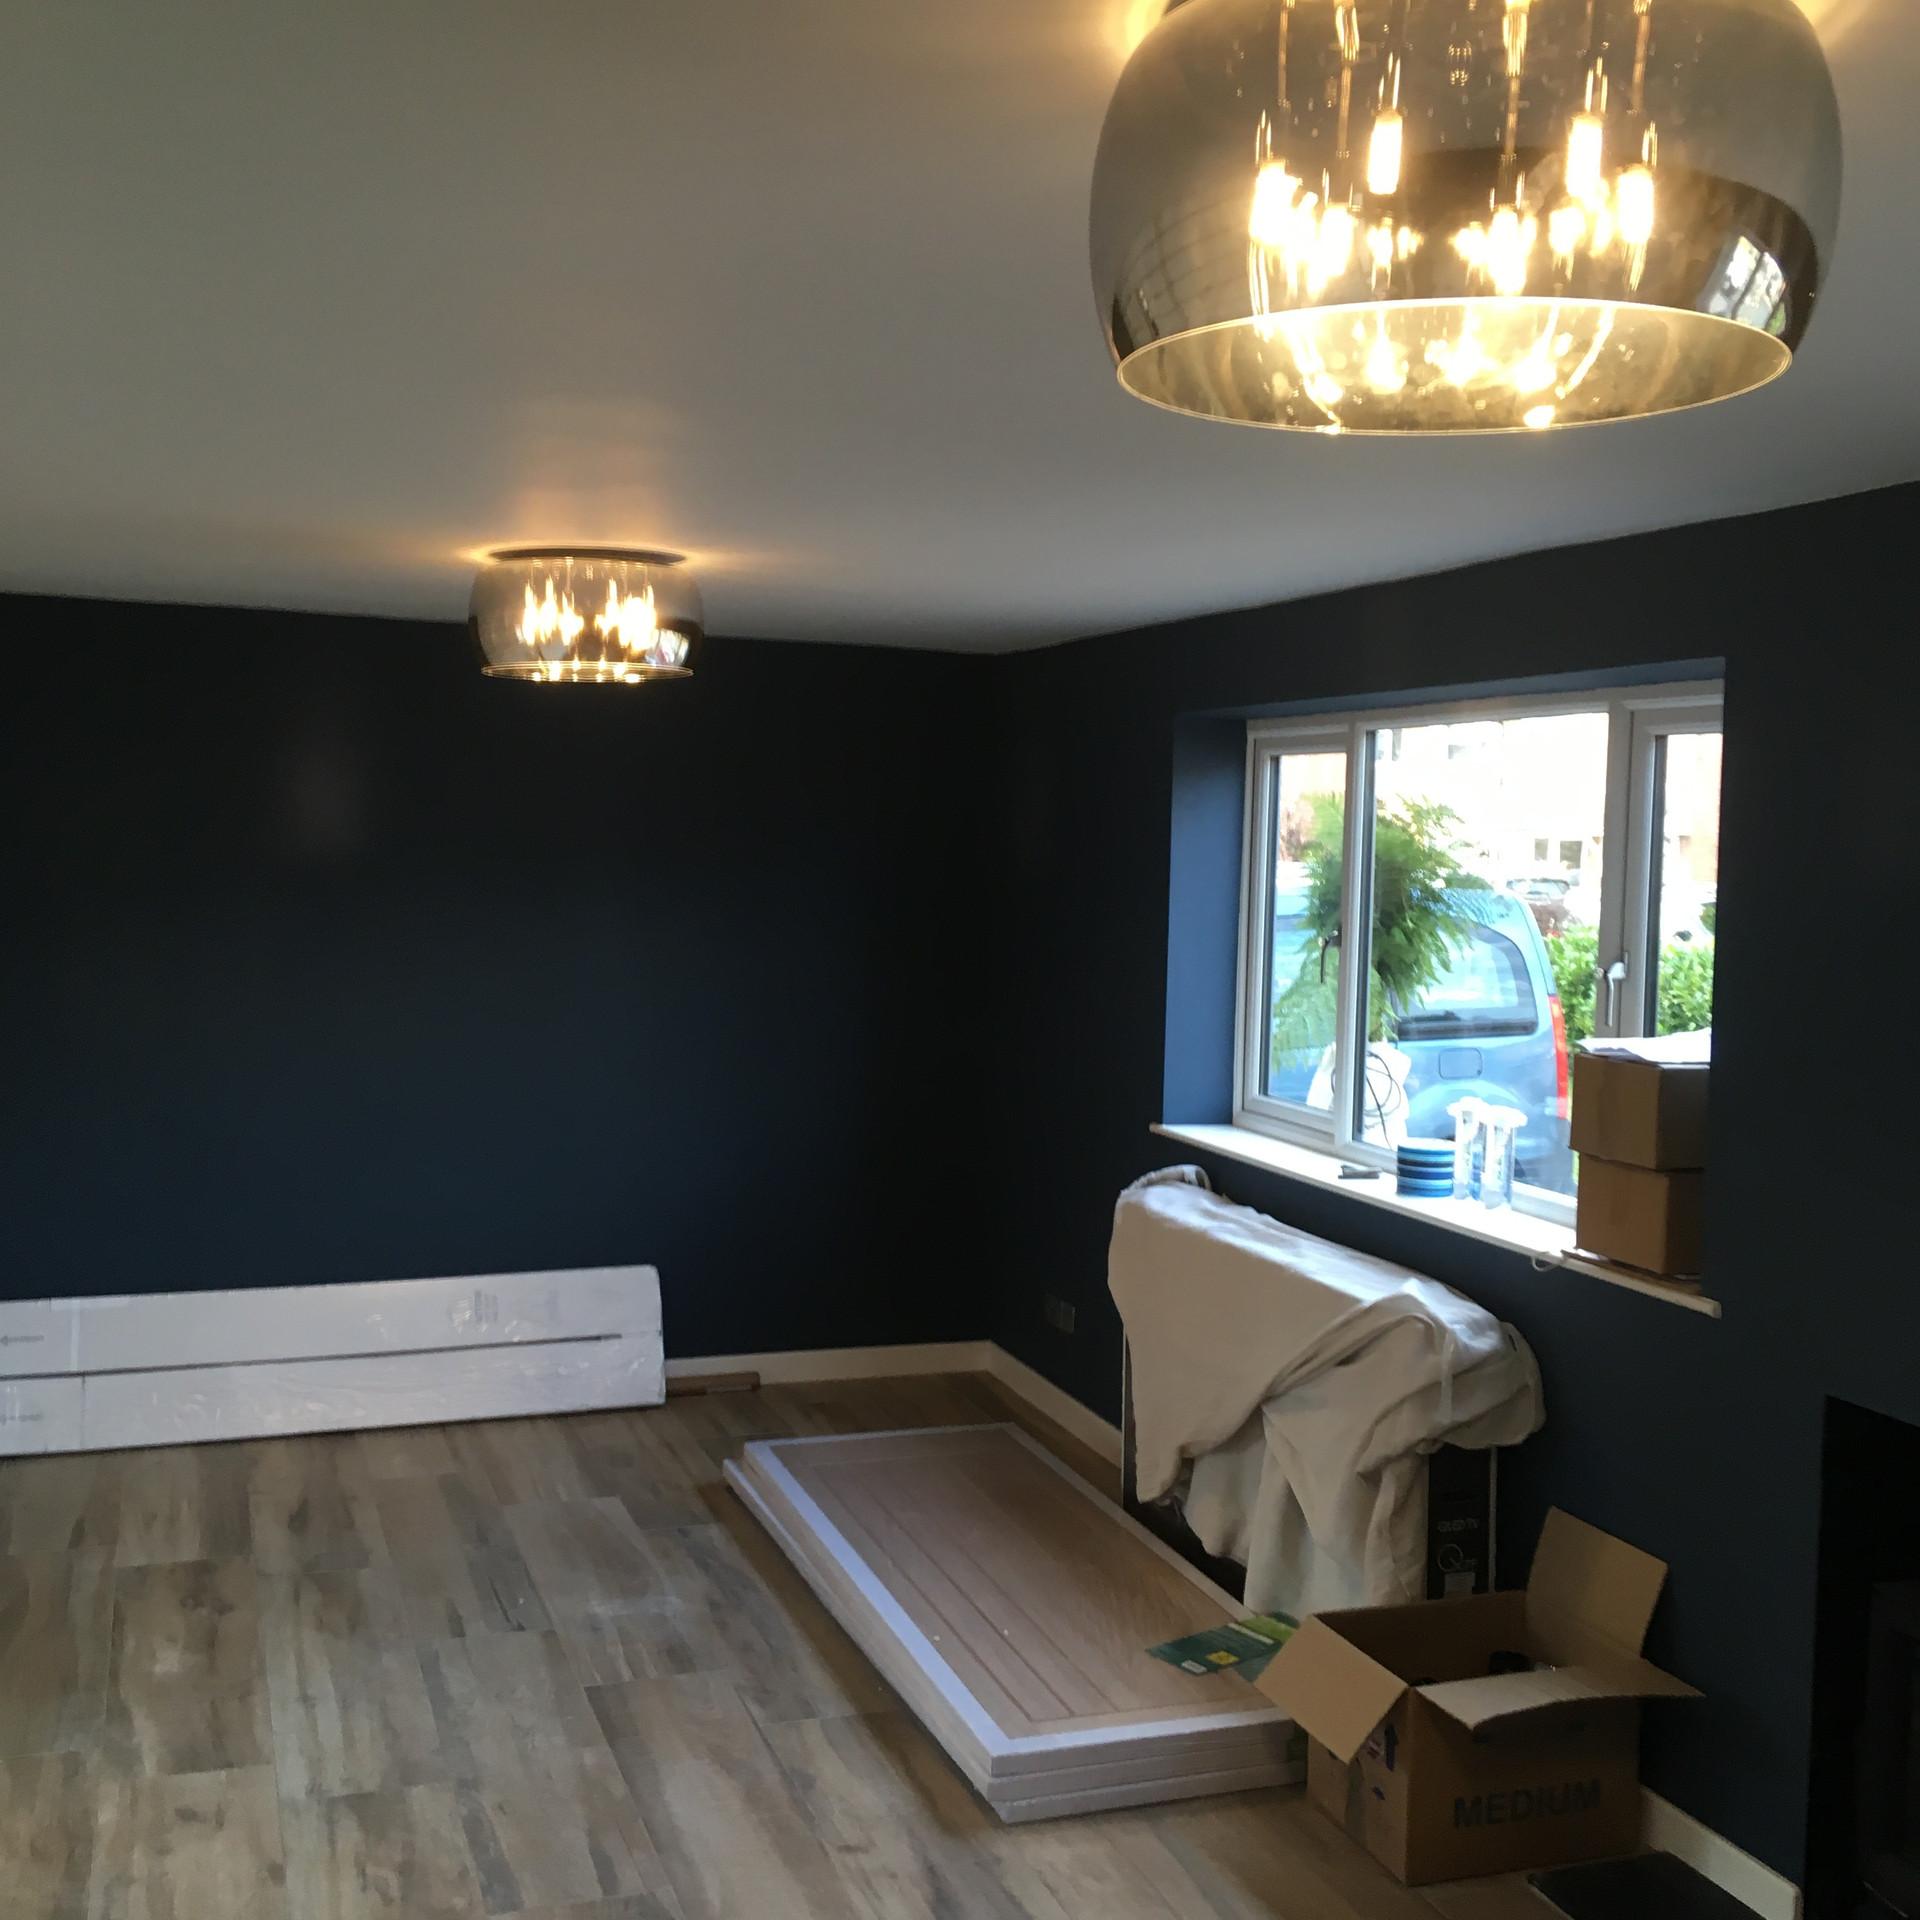 Designer lounge lighting scheme